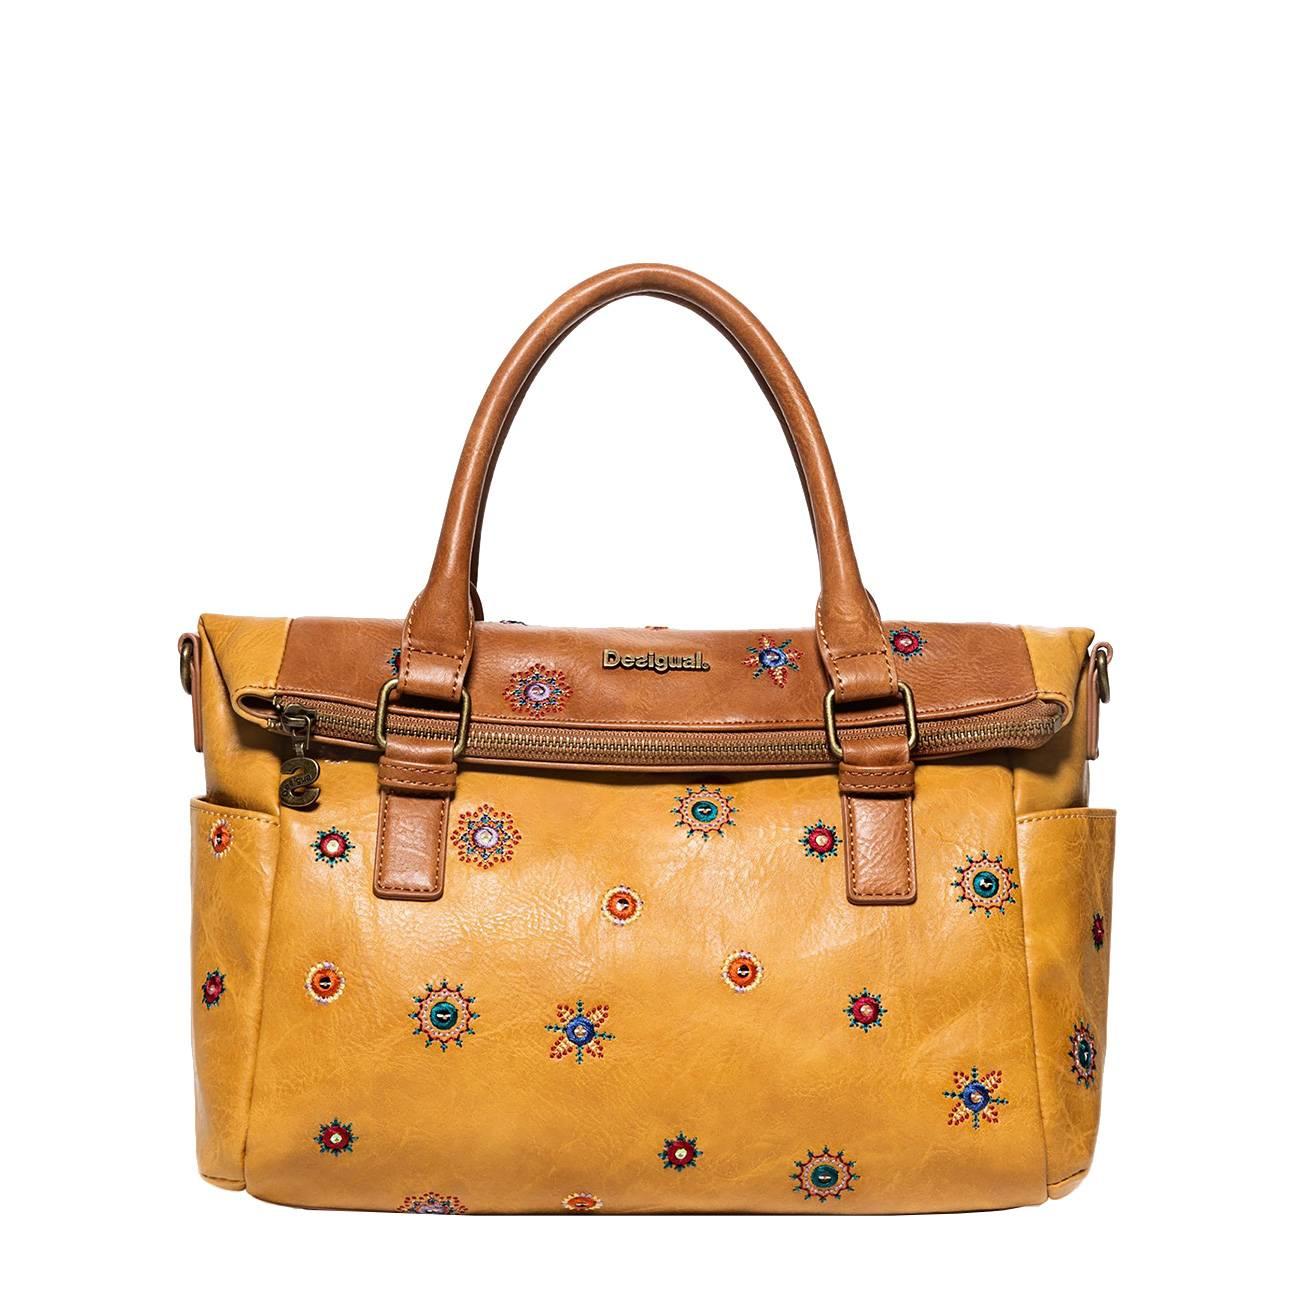 JULIETTA LOVERTY BAG